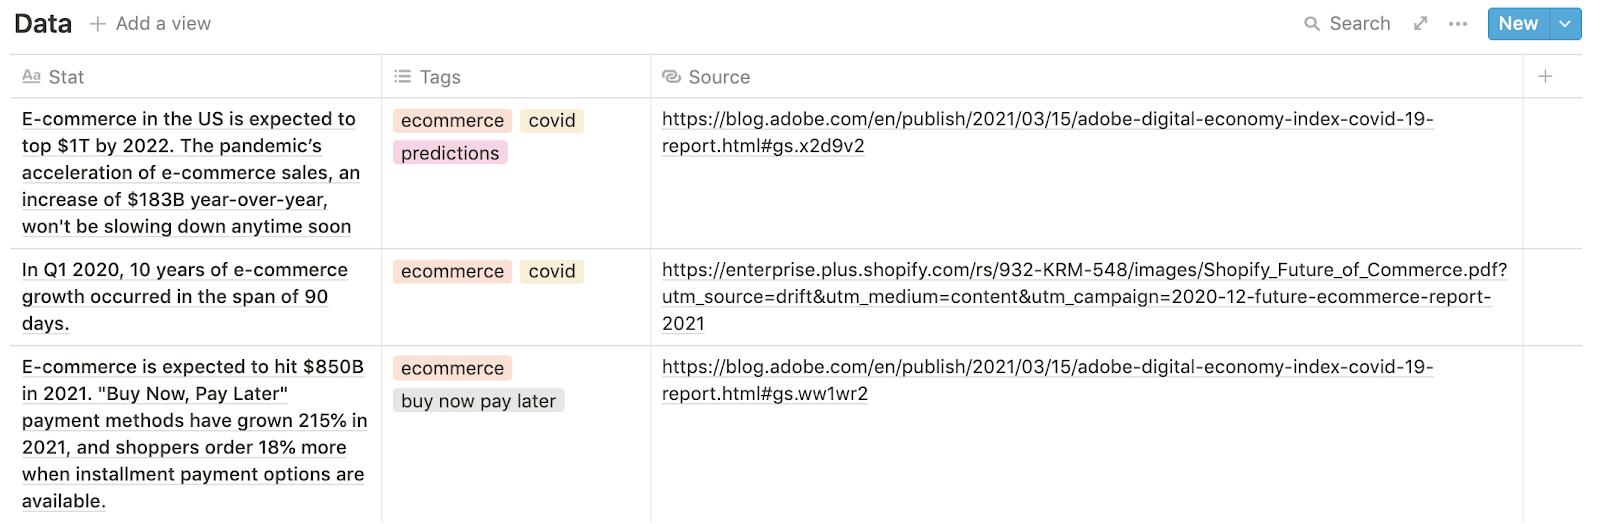 marketing swipe file example